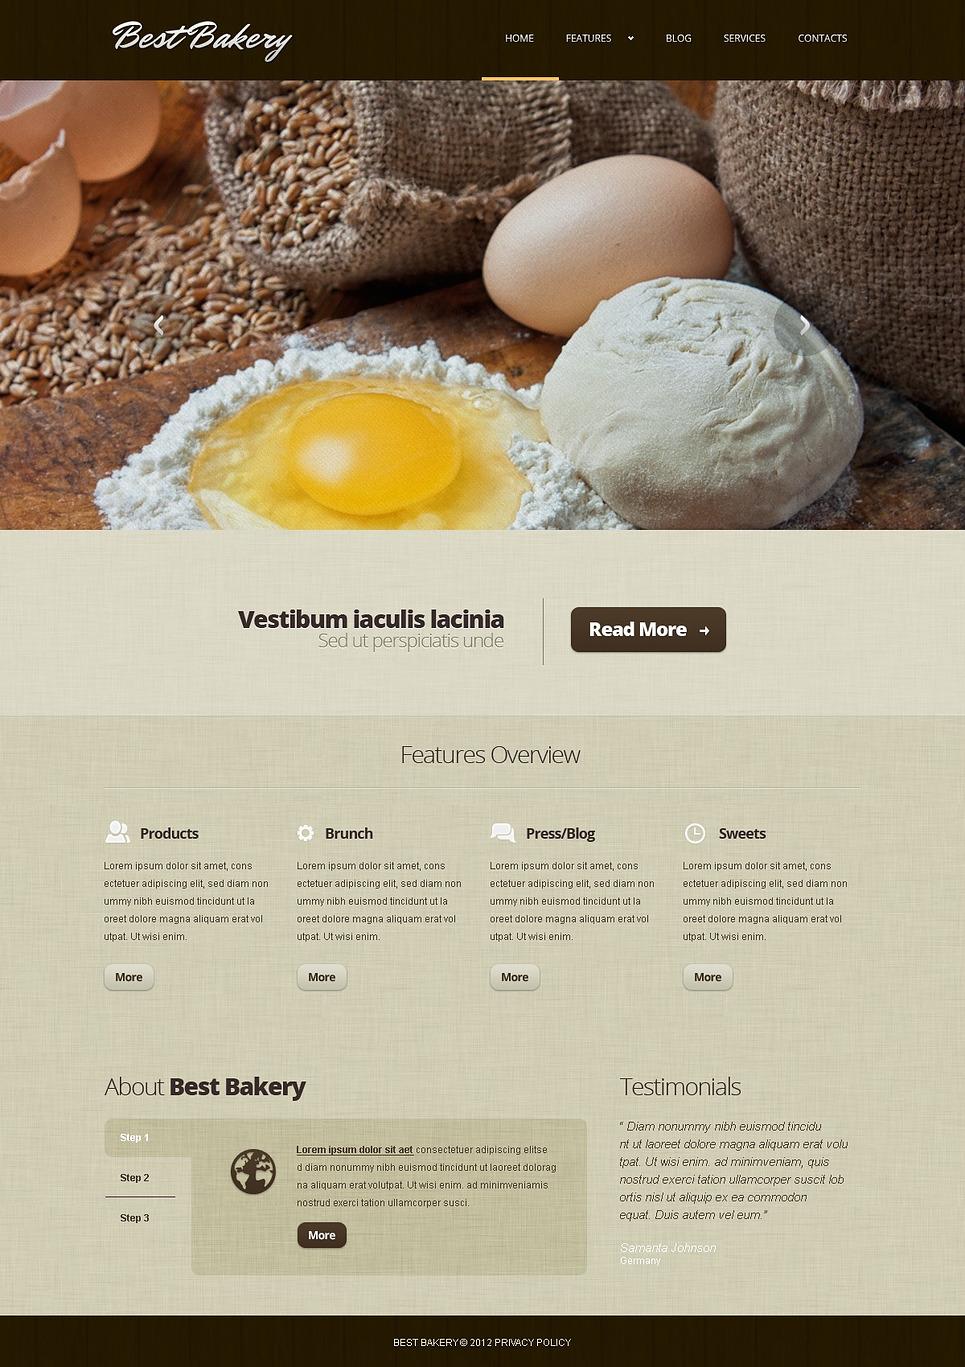 Well-Baked Bakery Responsive Joomla Template